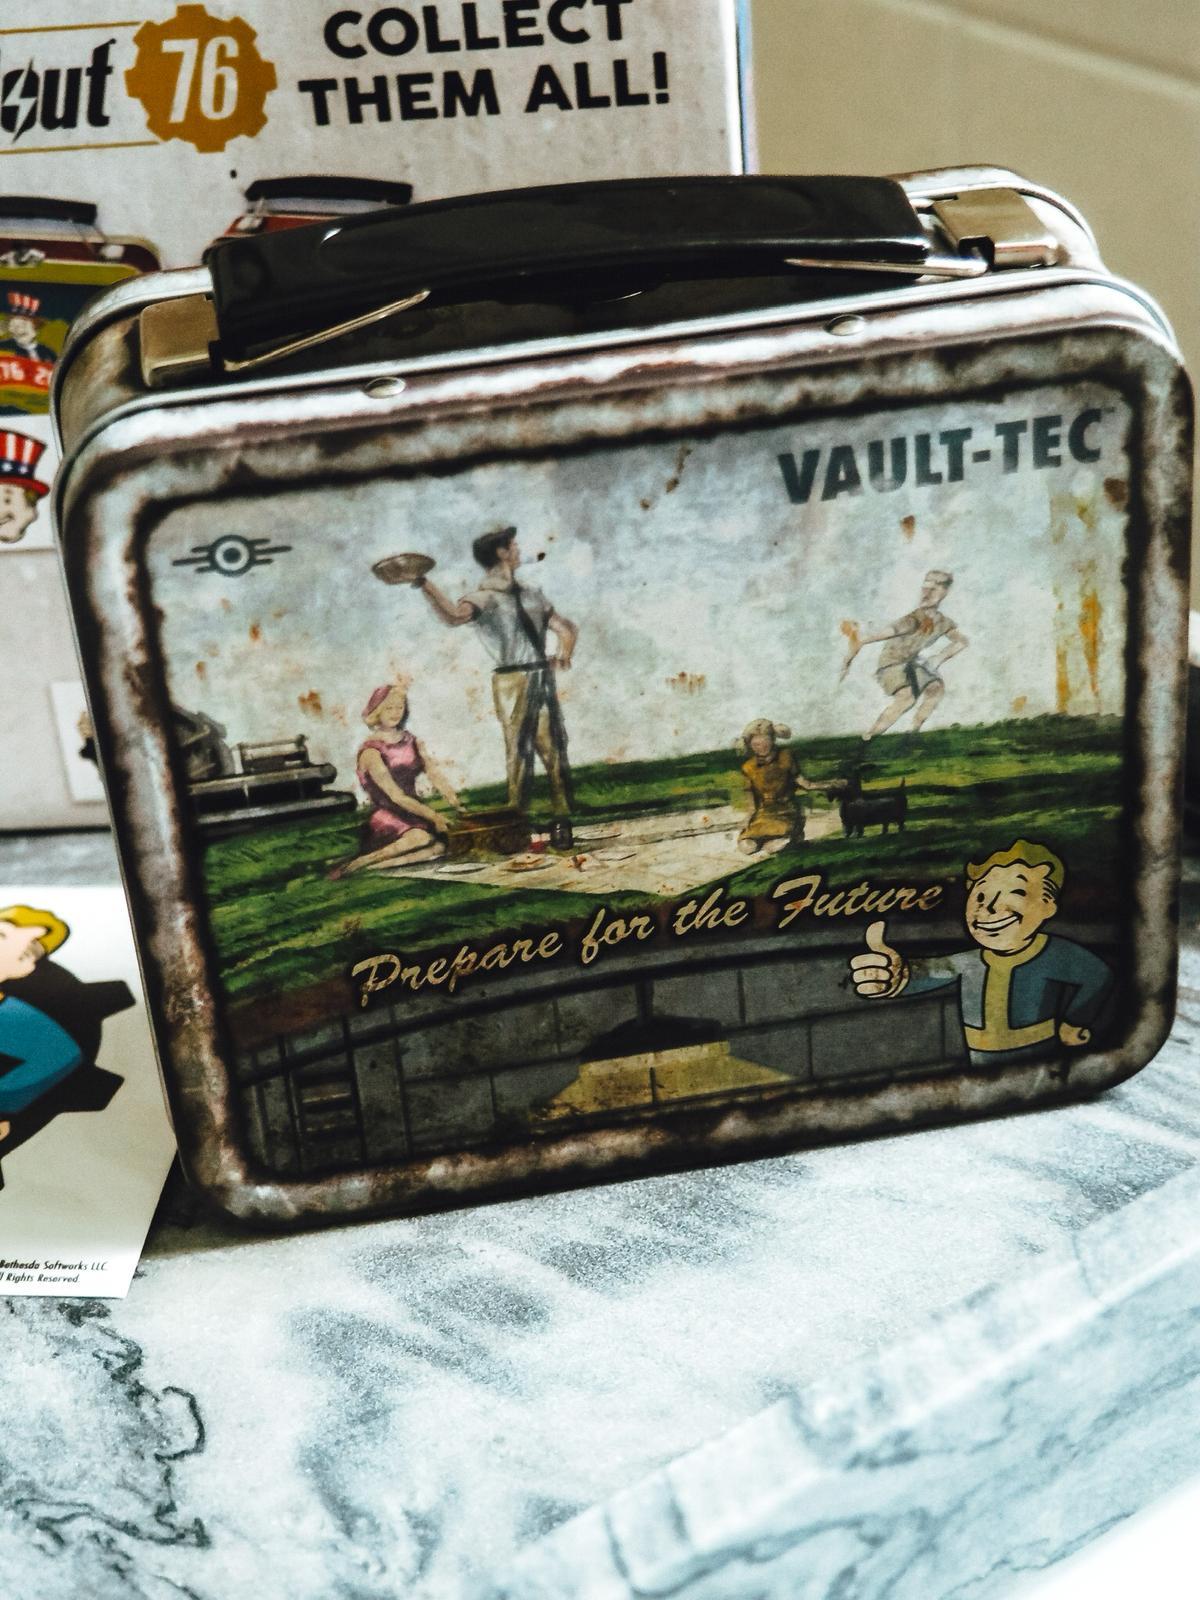 Kultiges Design der Mini-Box von Fallout.